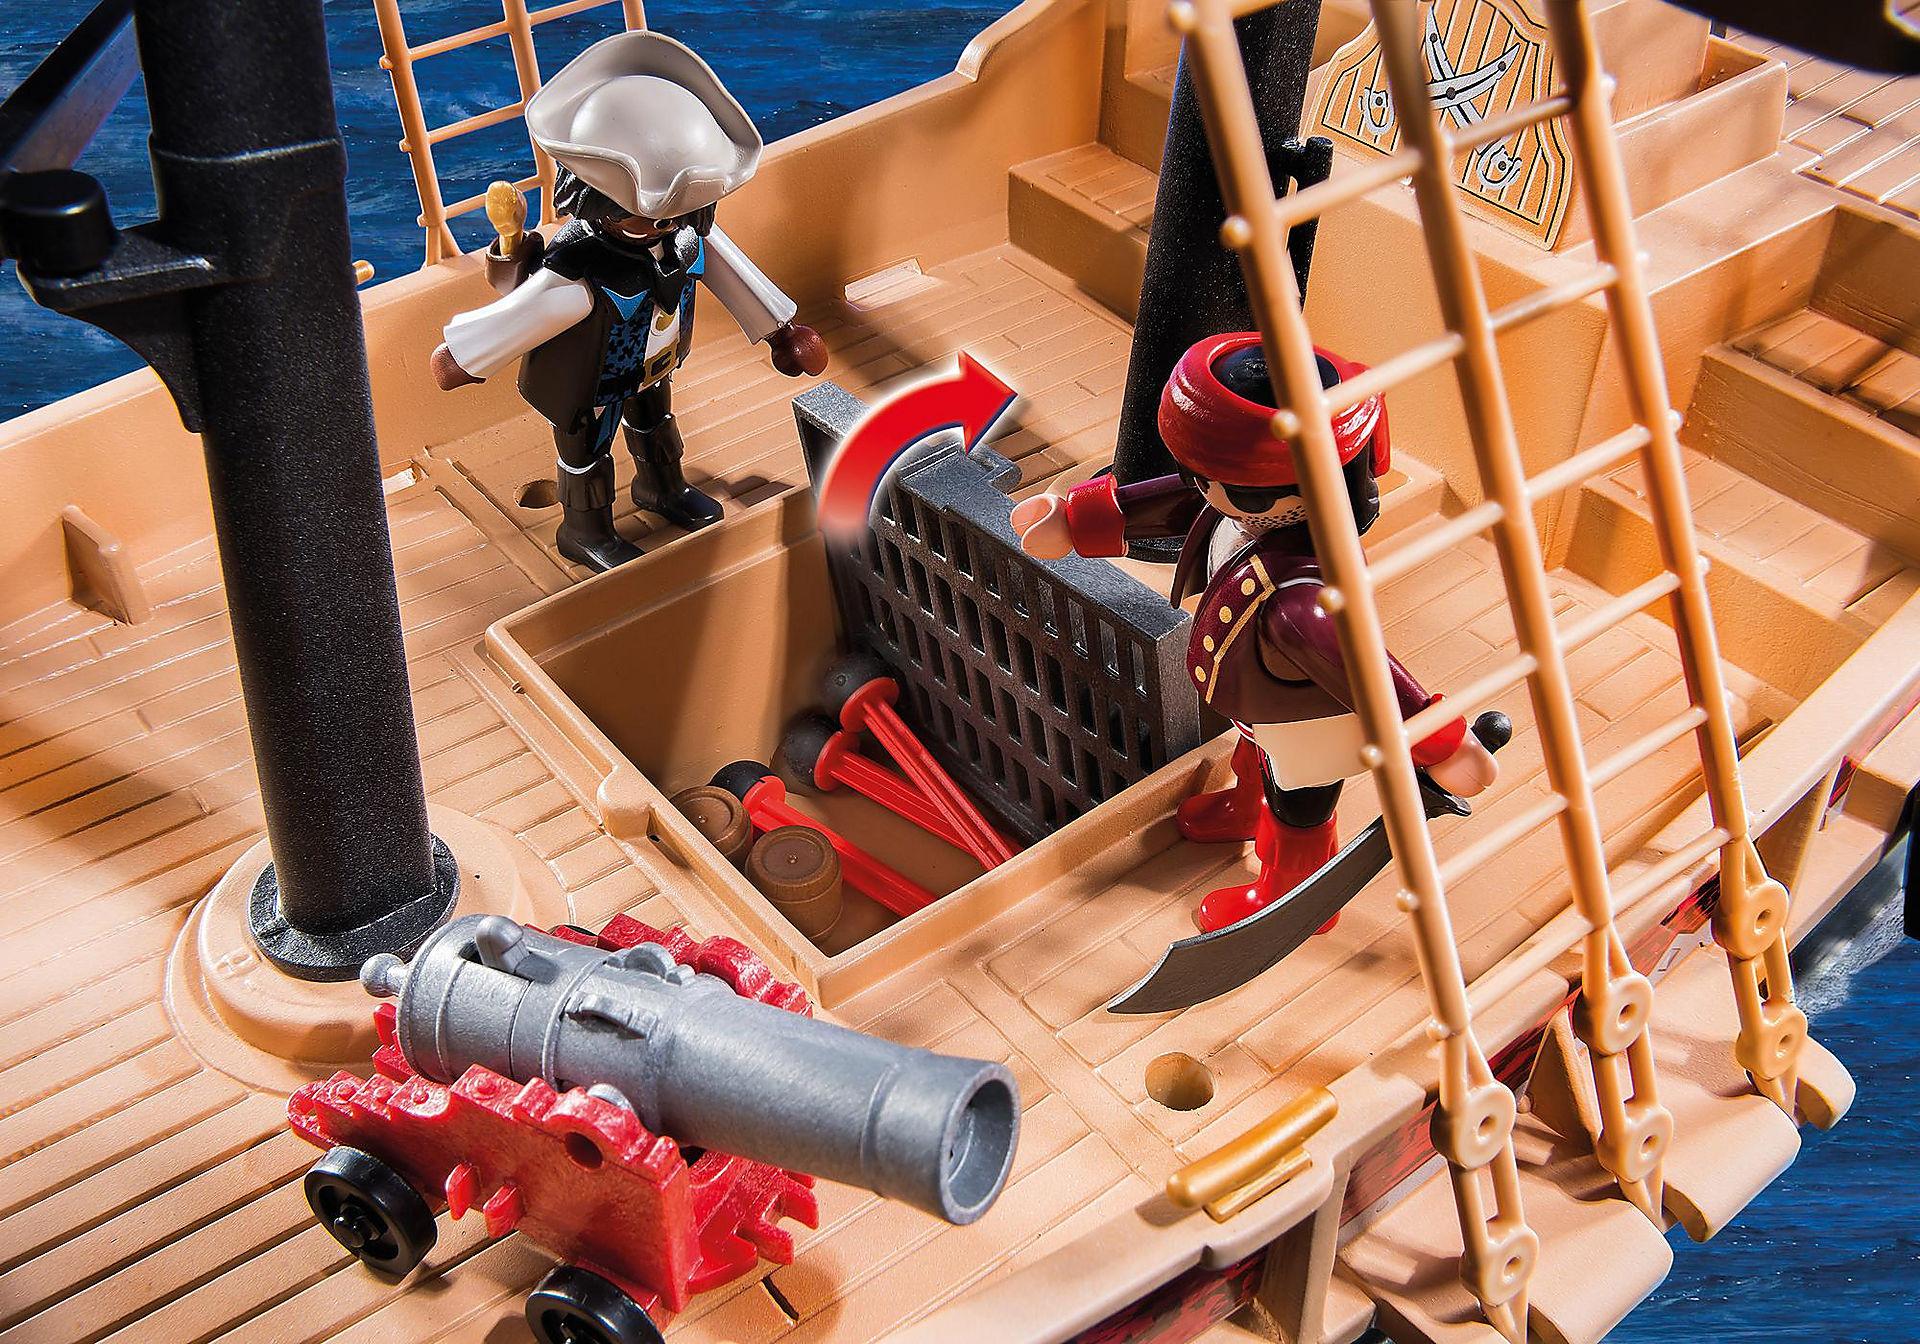 http://media.playmobil.com/i/playmobil/6678_product_extra2/Piraten-Kampfschiff